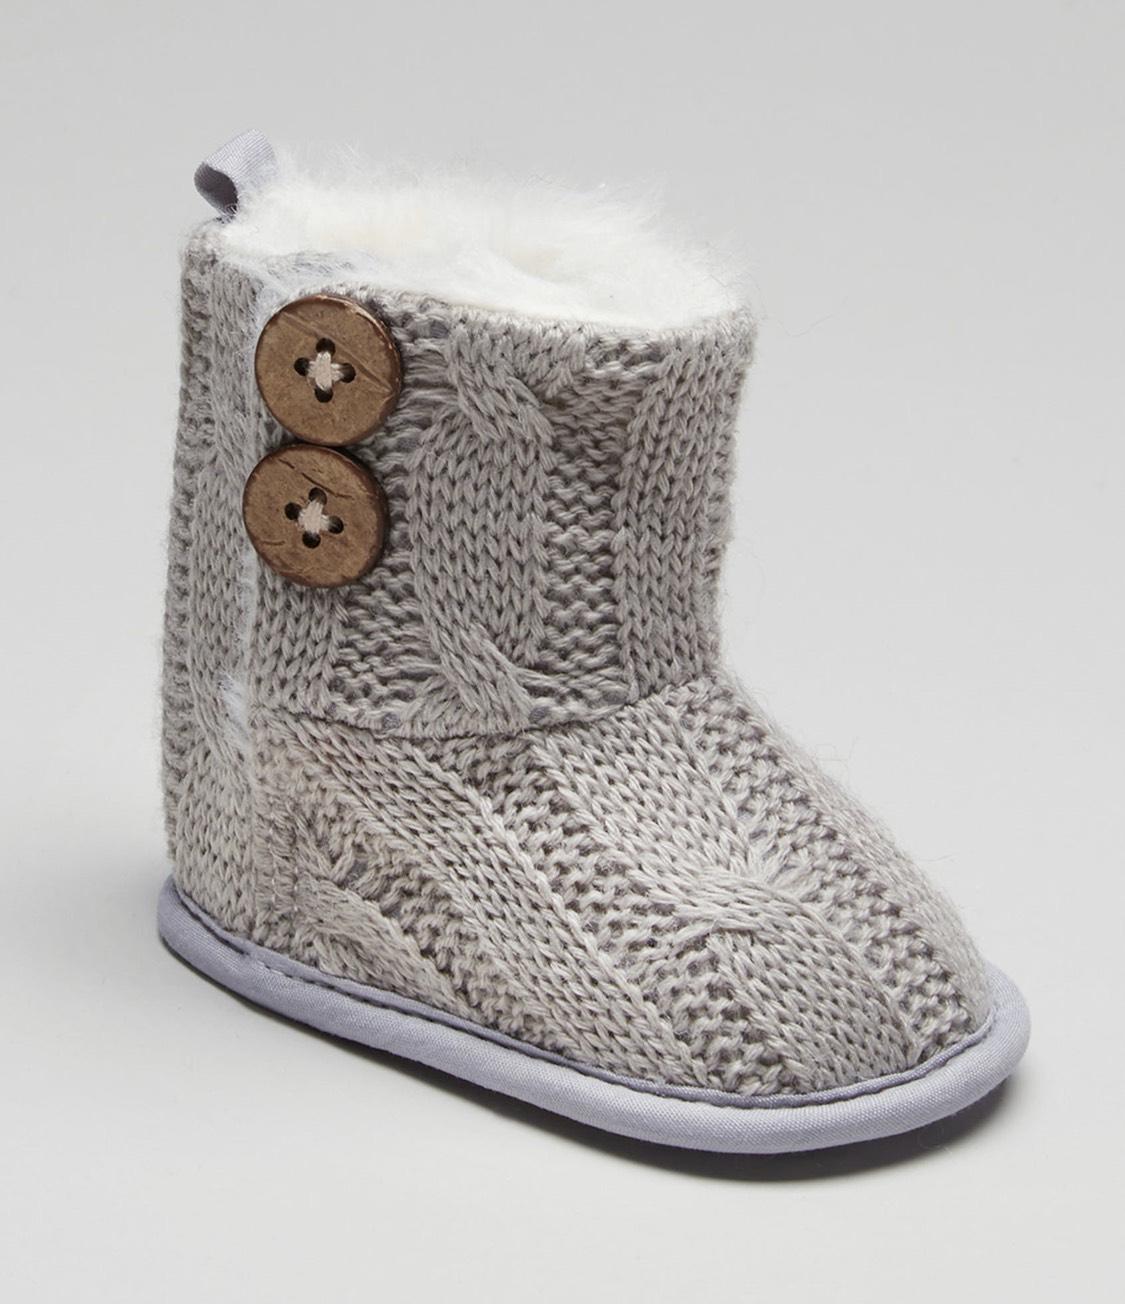 Unisex Soft Sole Baby Boots (Newborn-18mths 3 colours) £2.50 free c+c @ matalan